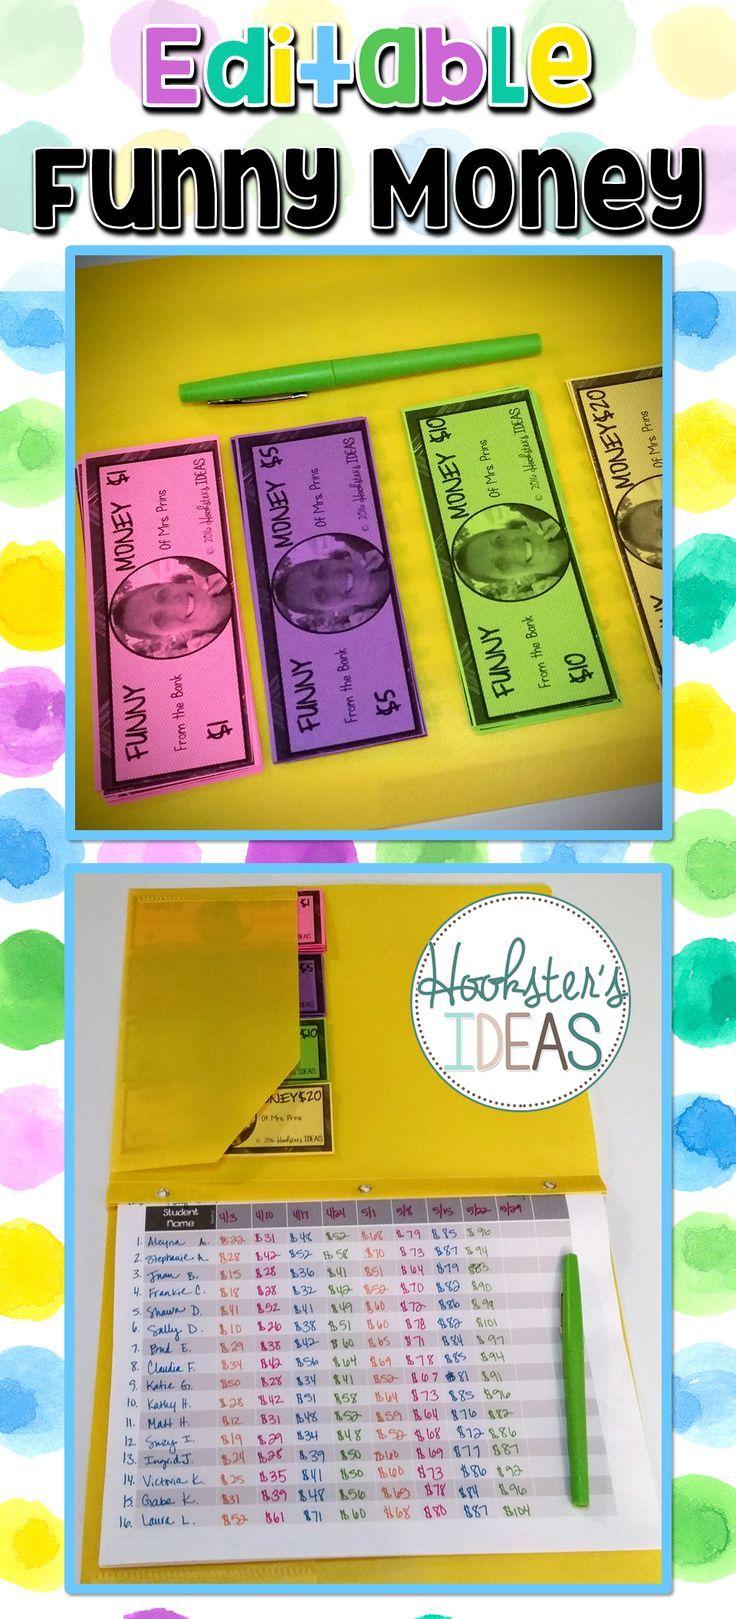 Pretend Play Money | Play money, Printable play money ... |Pretend Money For Classrooms